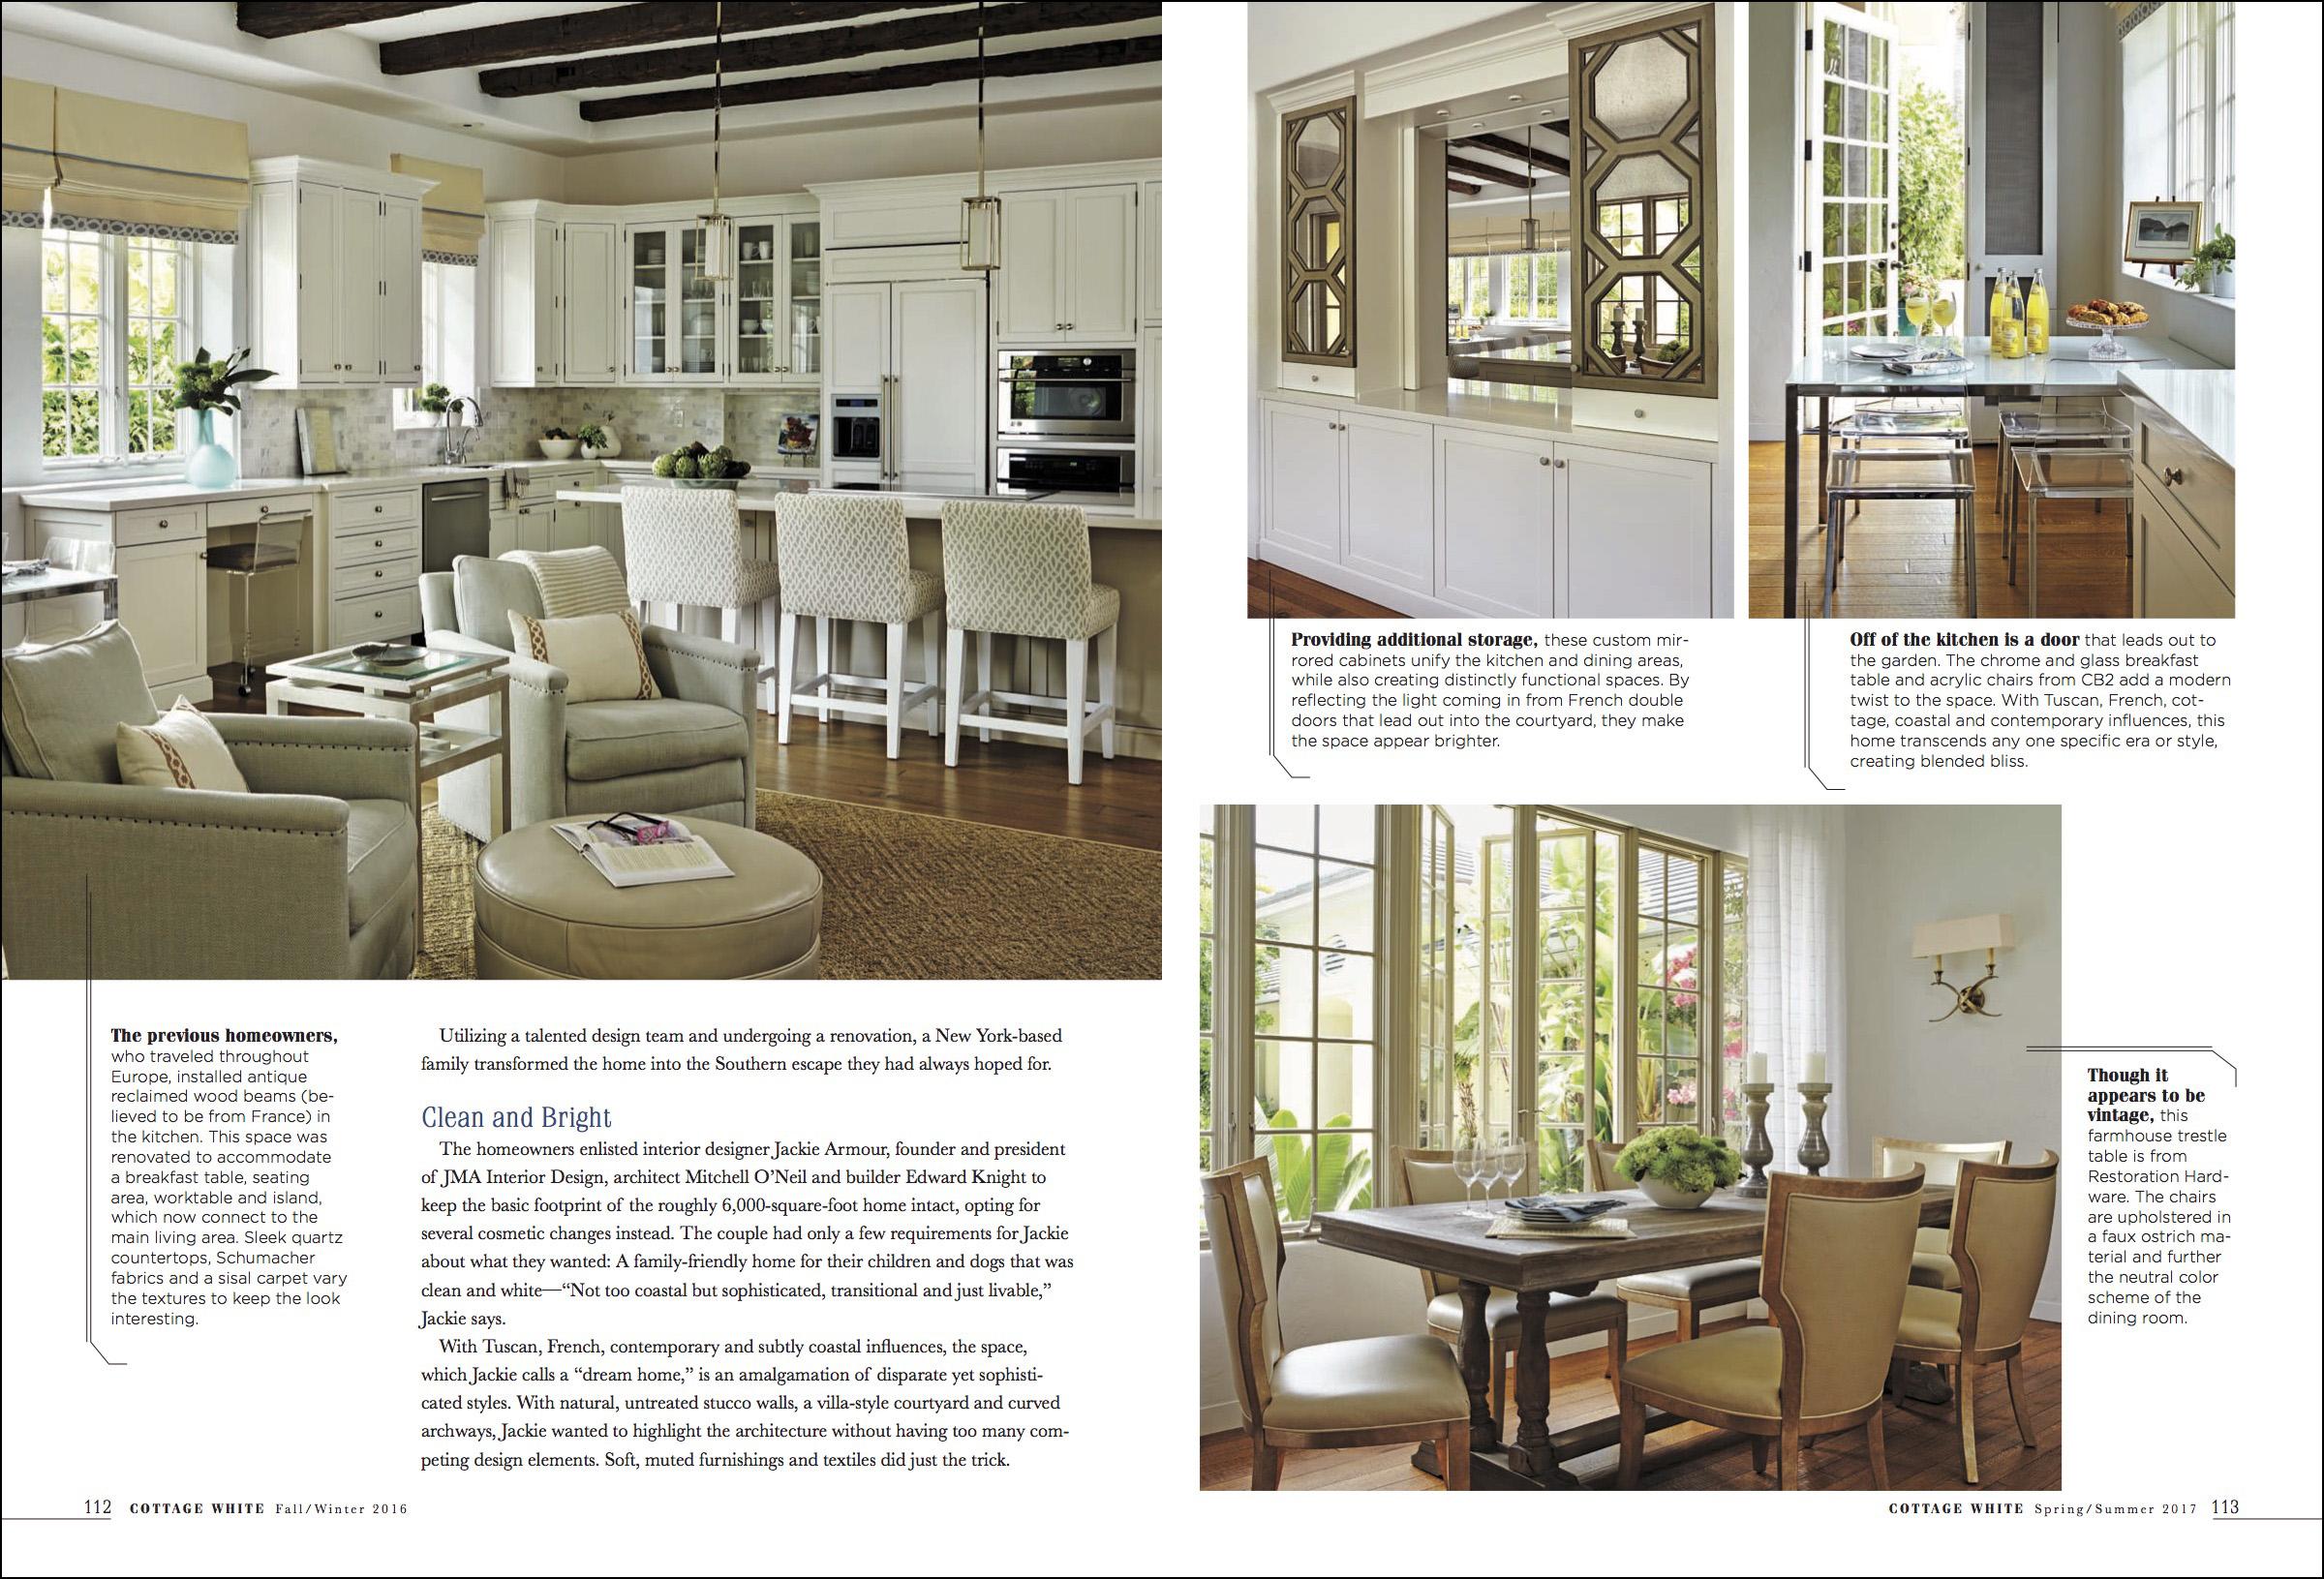 cottage white magazine design article brantley photography